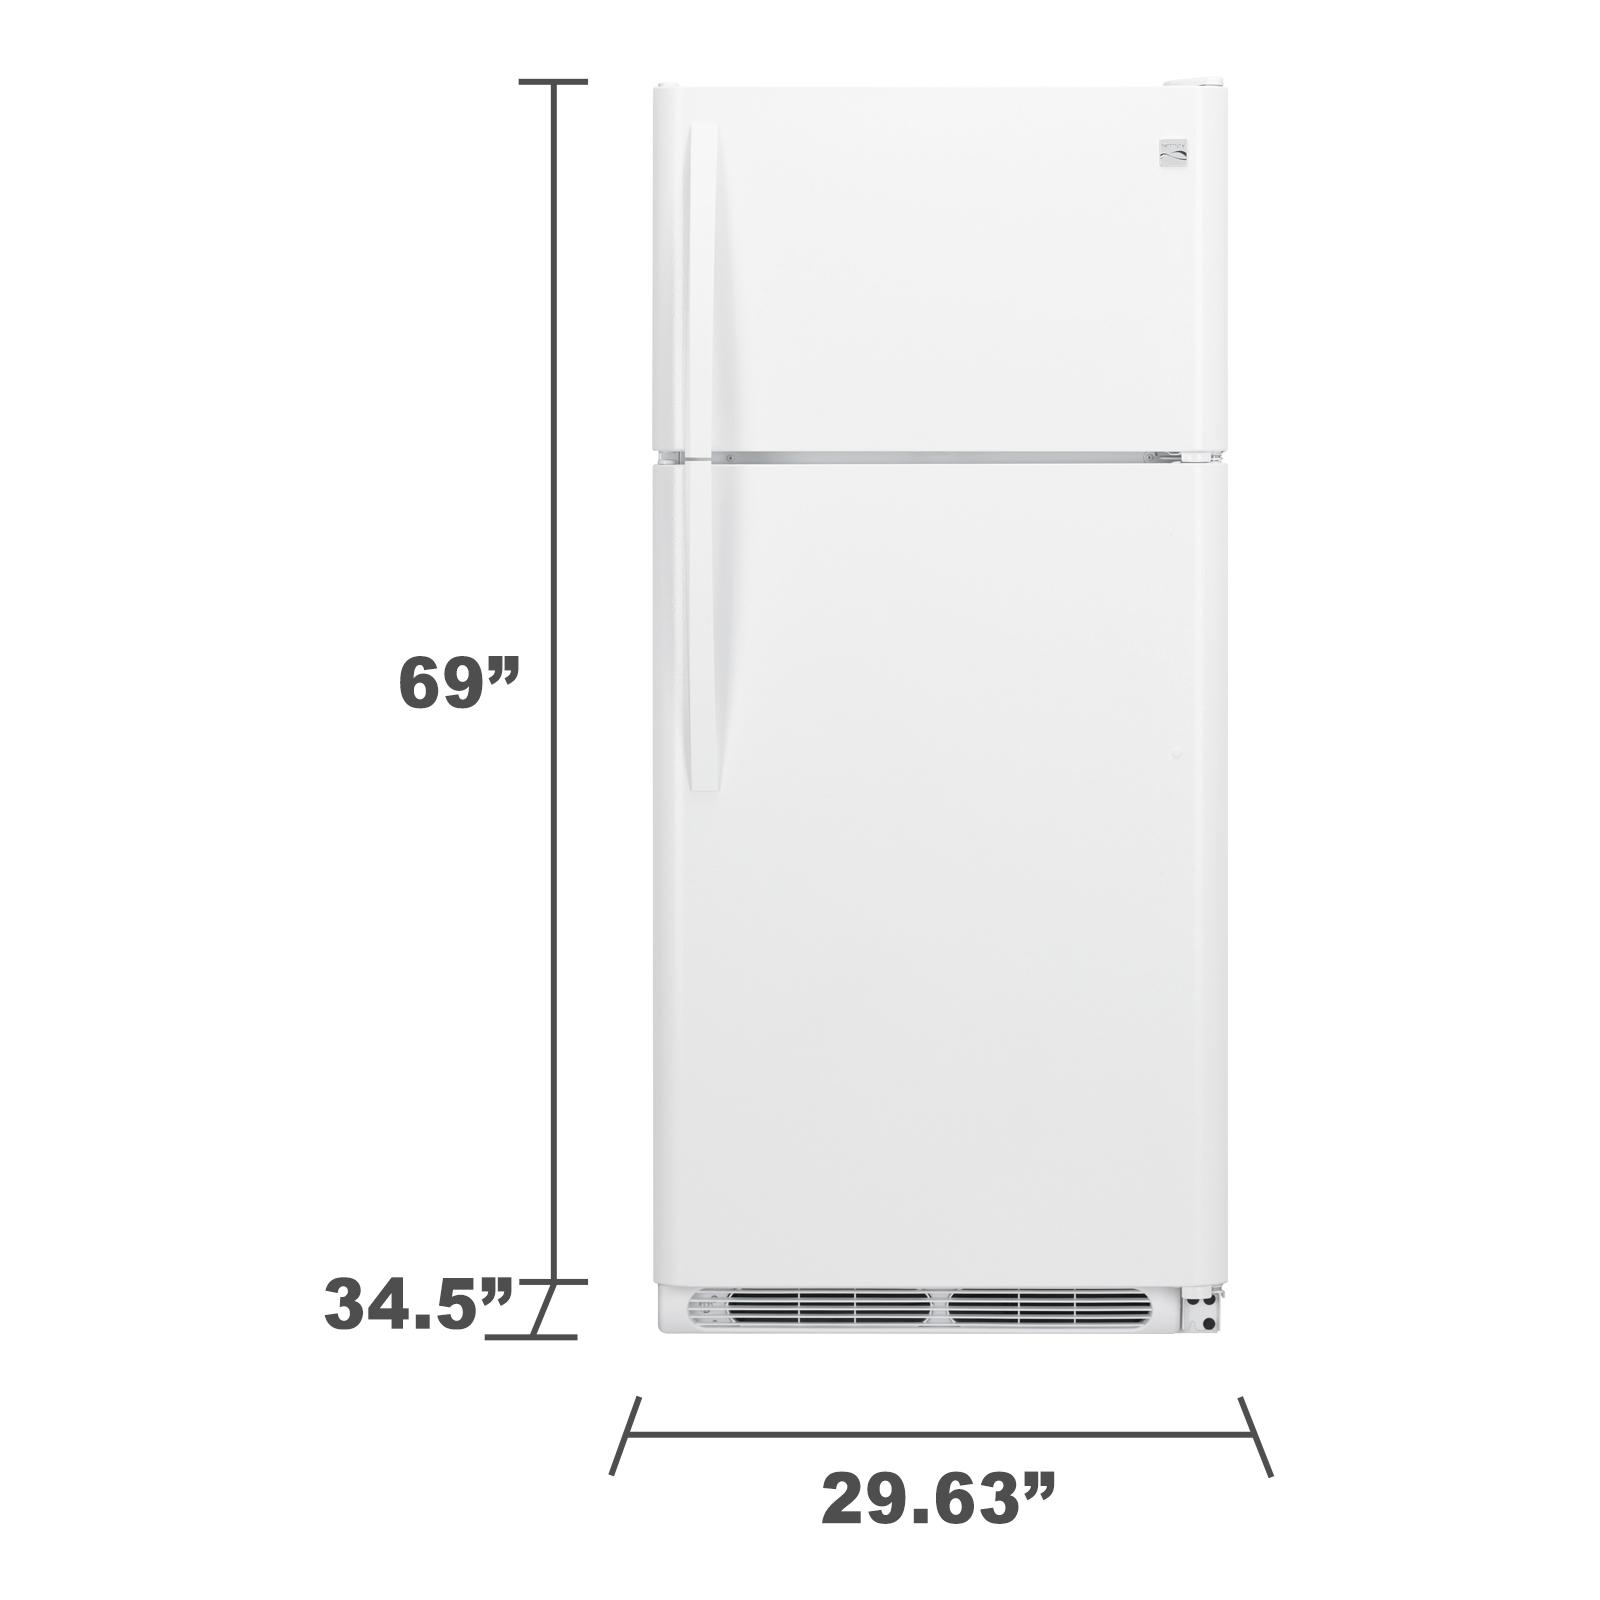 Kenmore 60082 20.4 cu. ft. Top Freezer Refrigerator - White